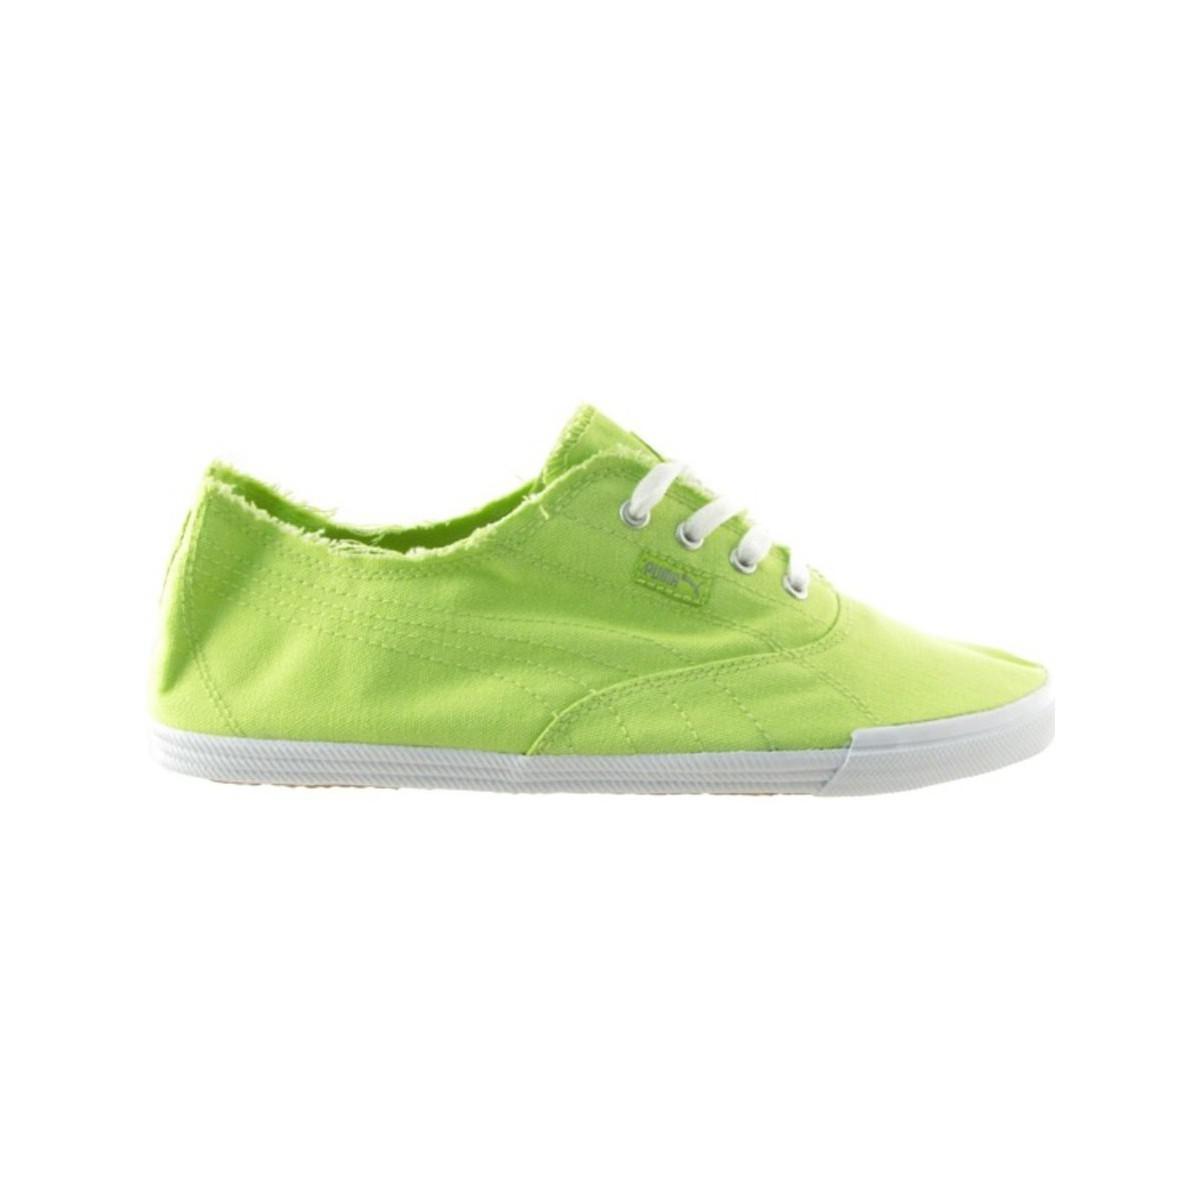 PUMA Tekkies Brites Women's Shoes